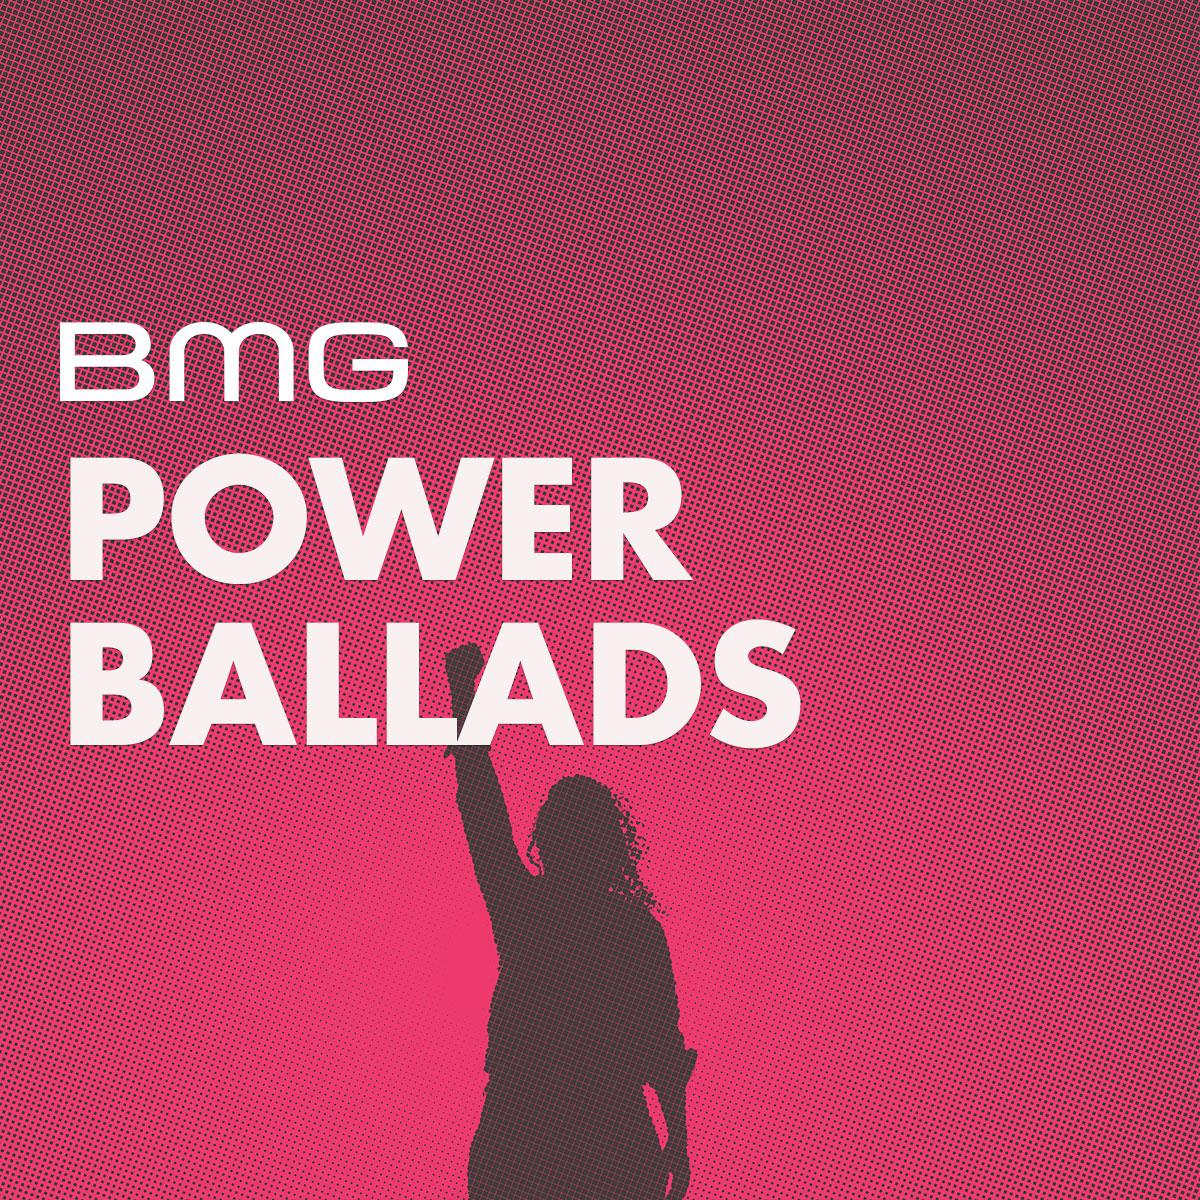 1200-x-1200-Power-Ballads.jpg